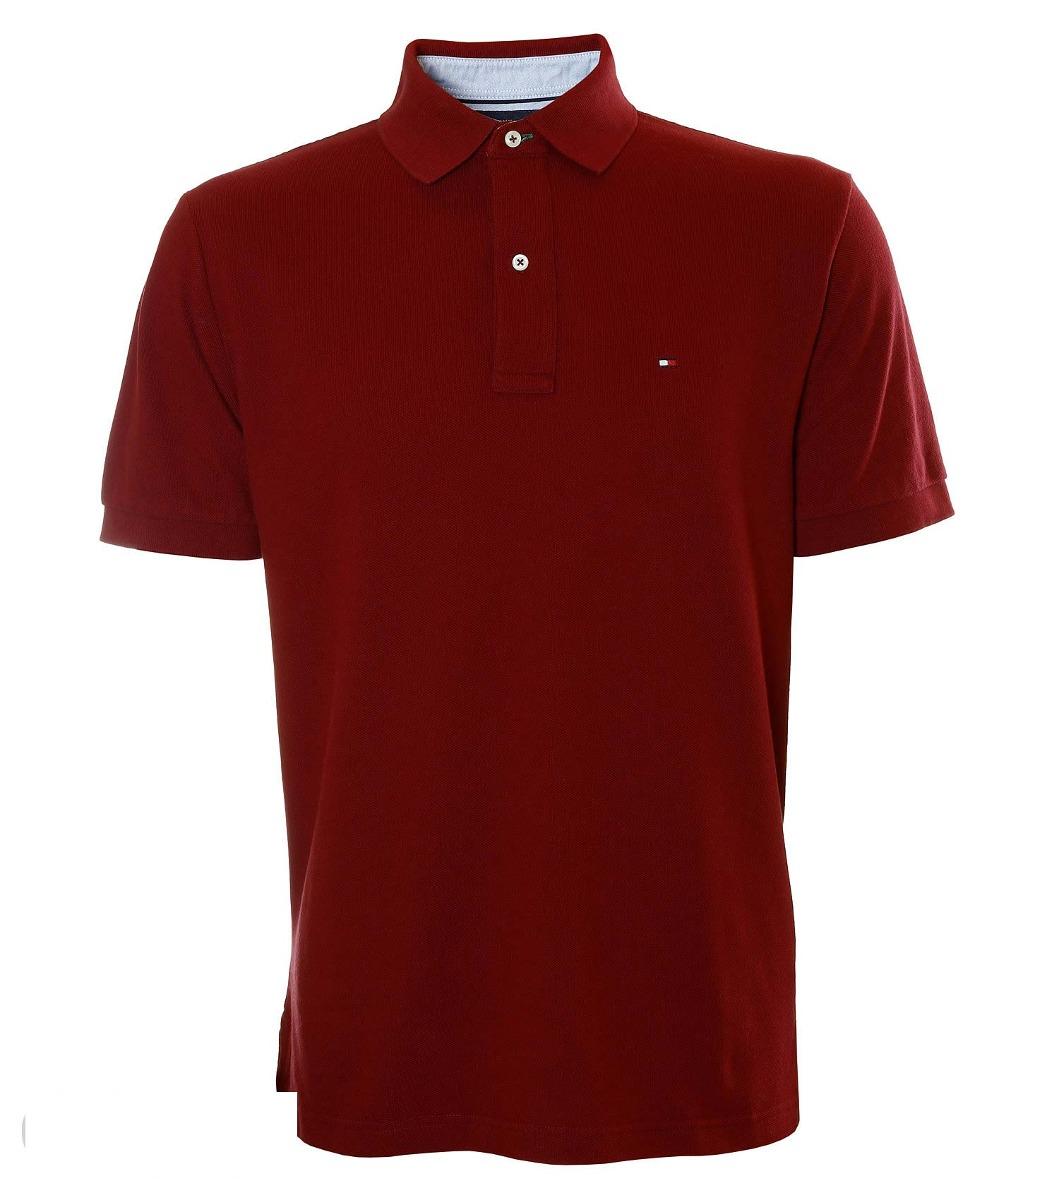 40a0c388b Camisa Polo Masculina Tommy Hilfiger Bordeaux Solid - R$ 259,90 em ...